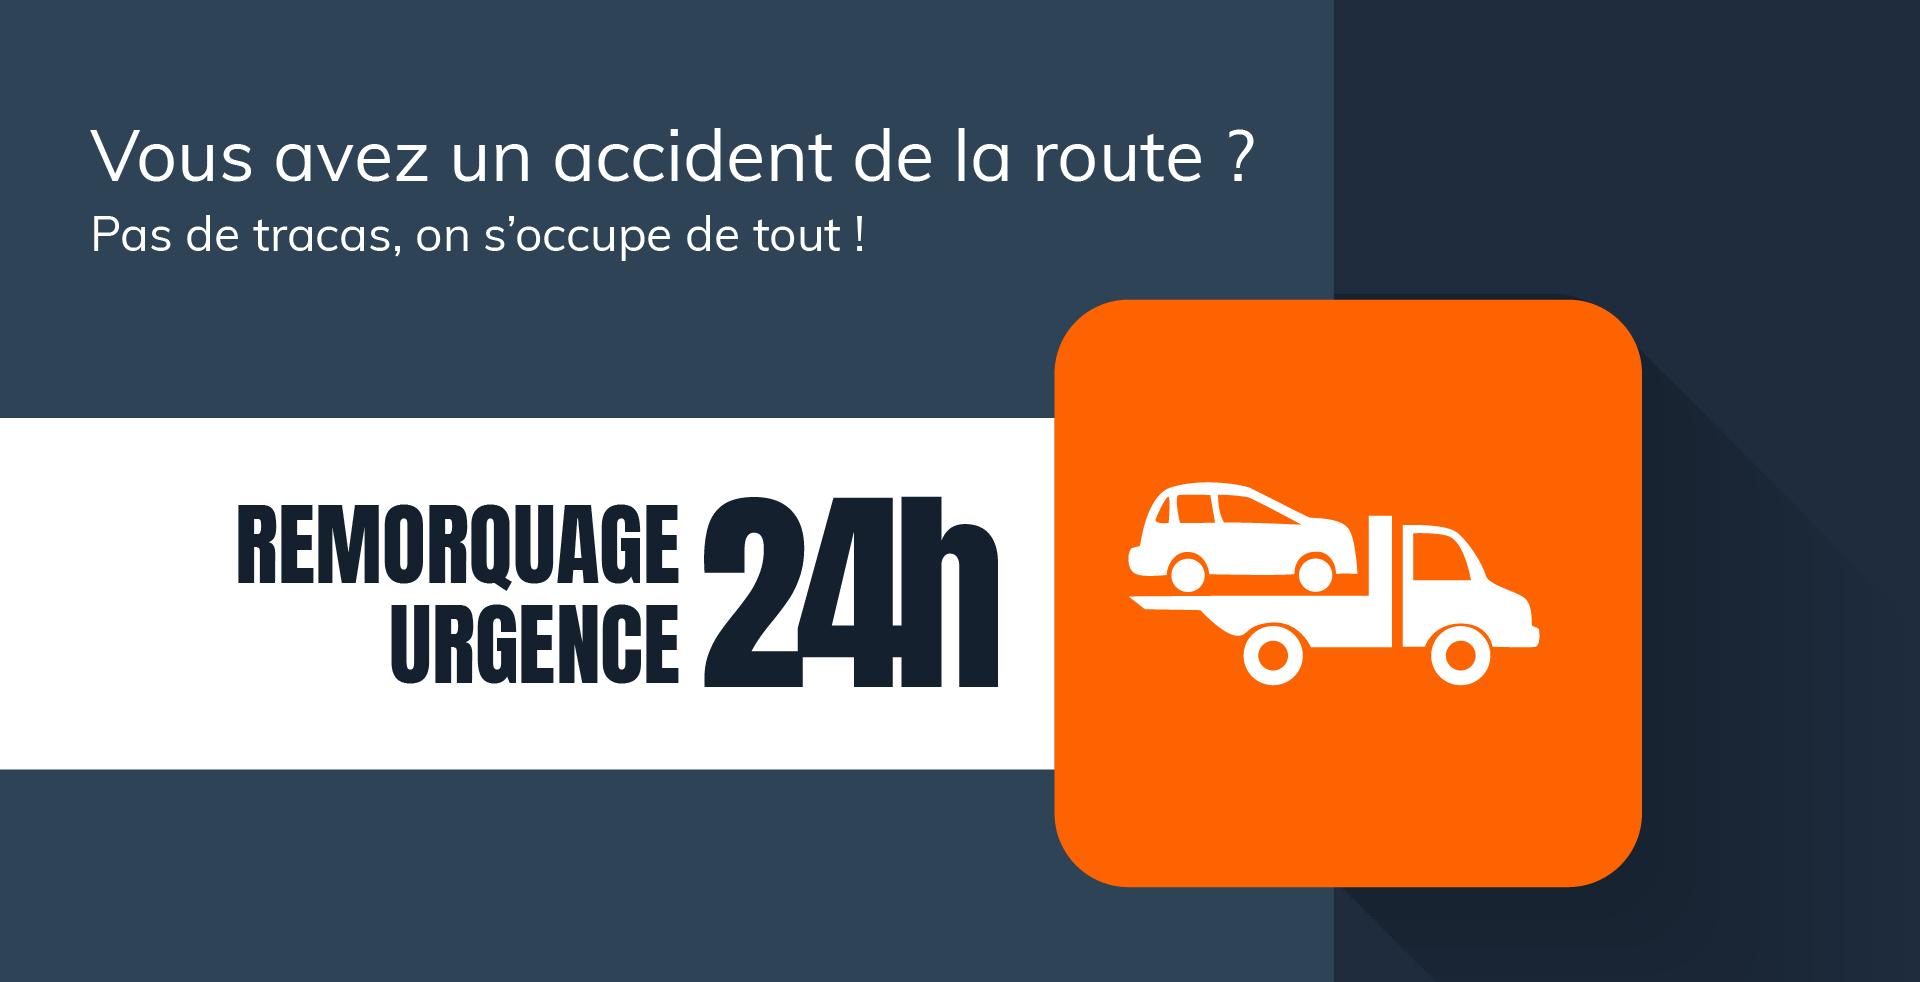 Remorquage Urgence 24h Montreal (514)617-3333